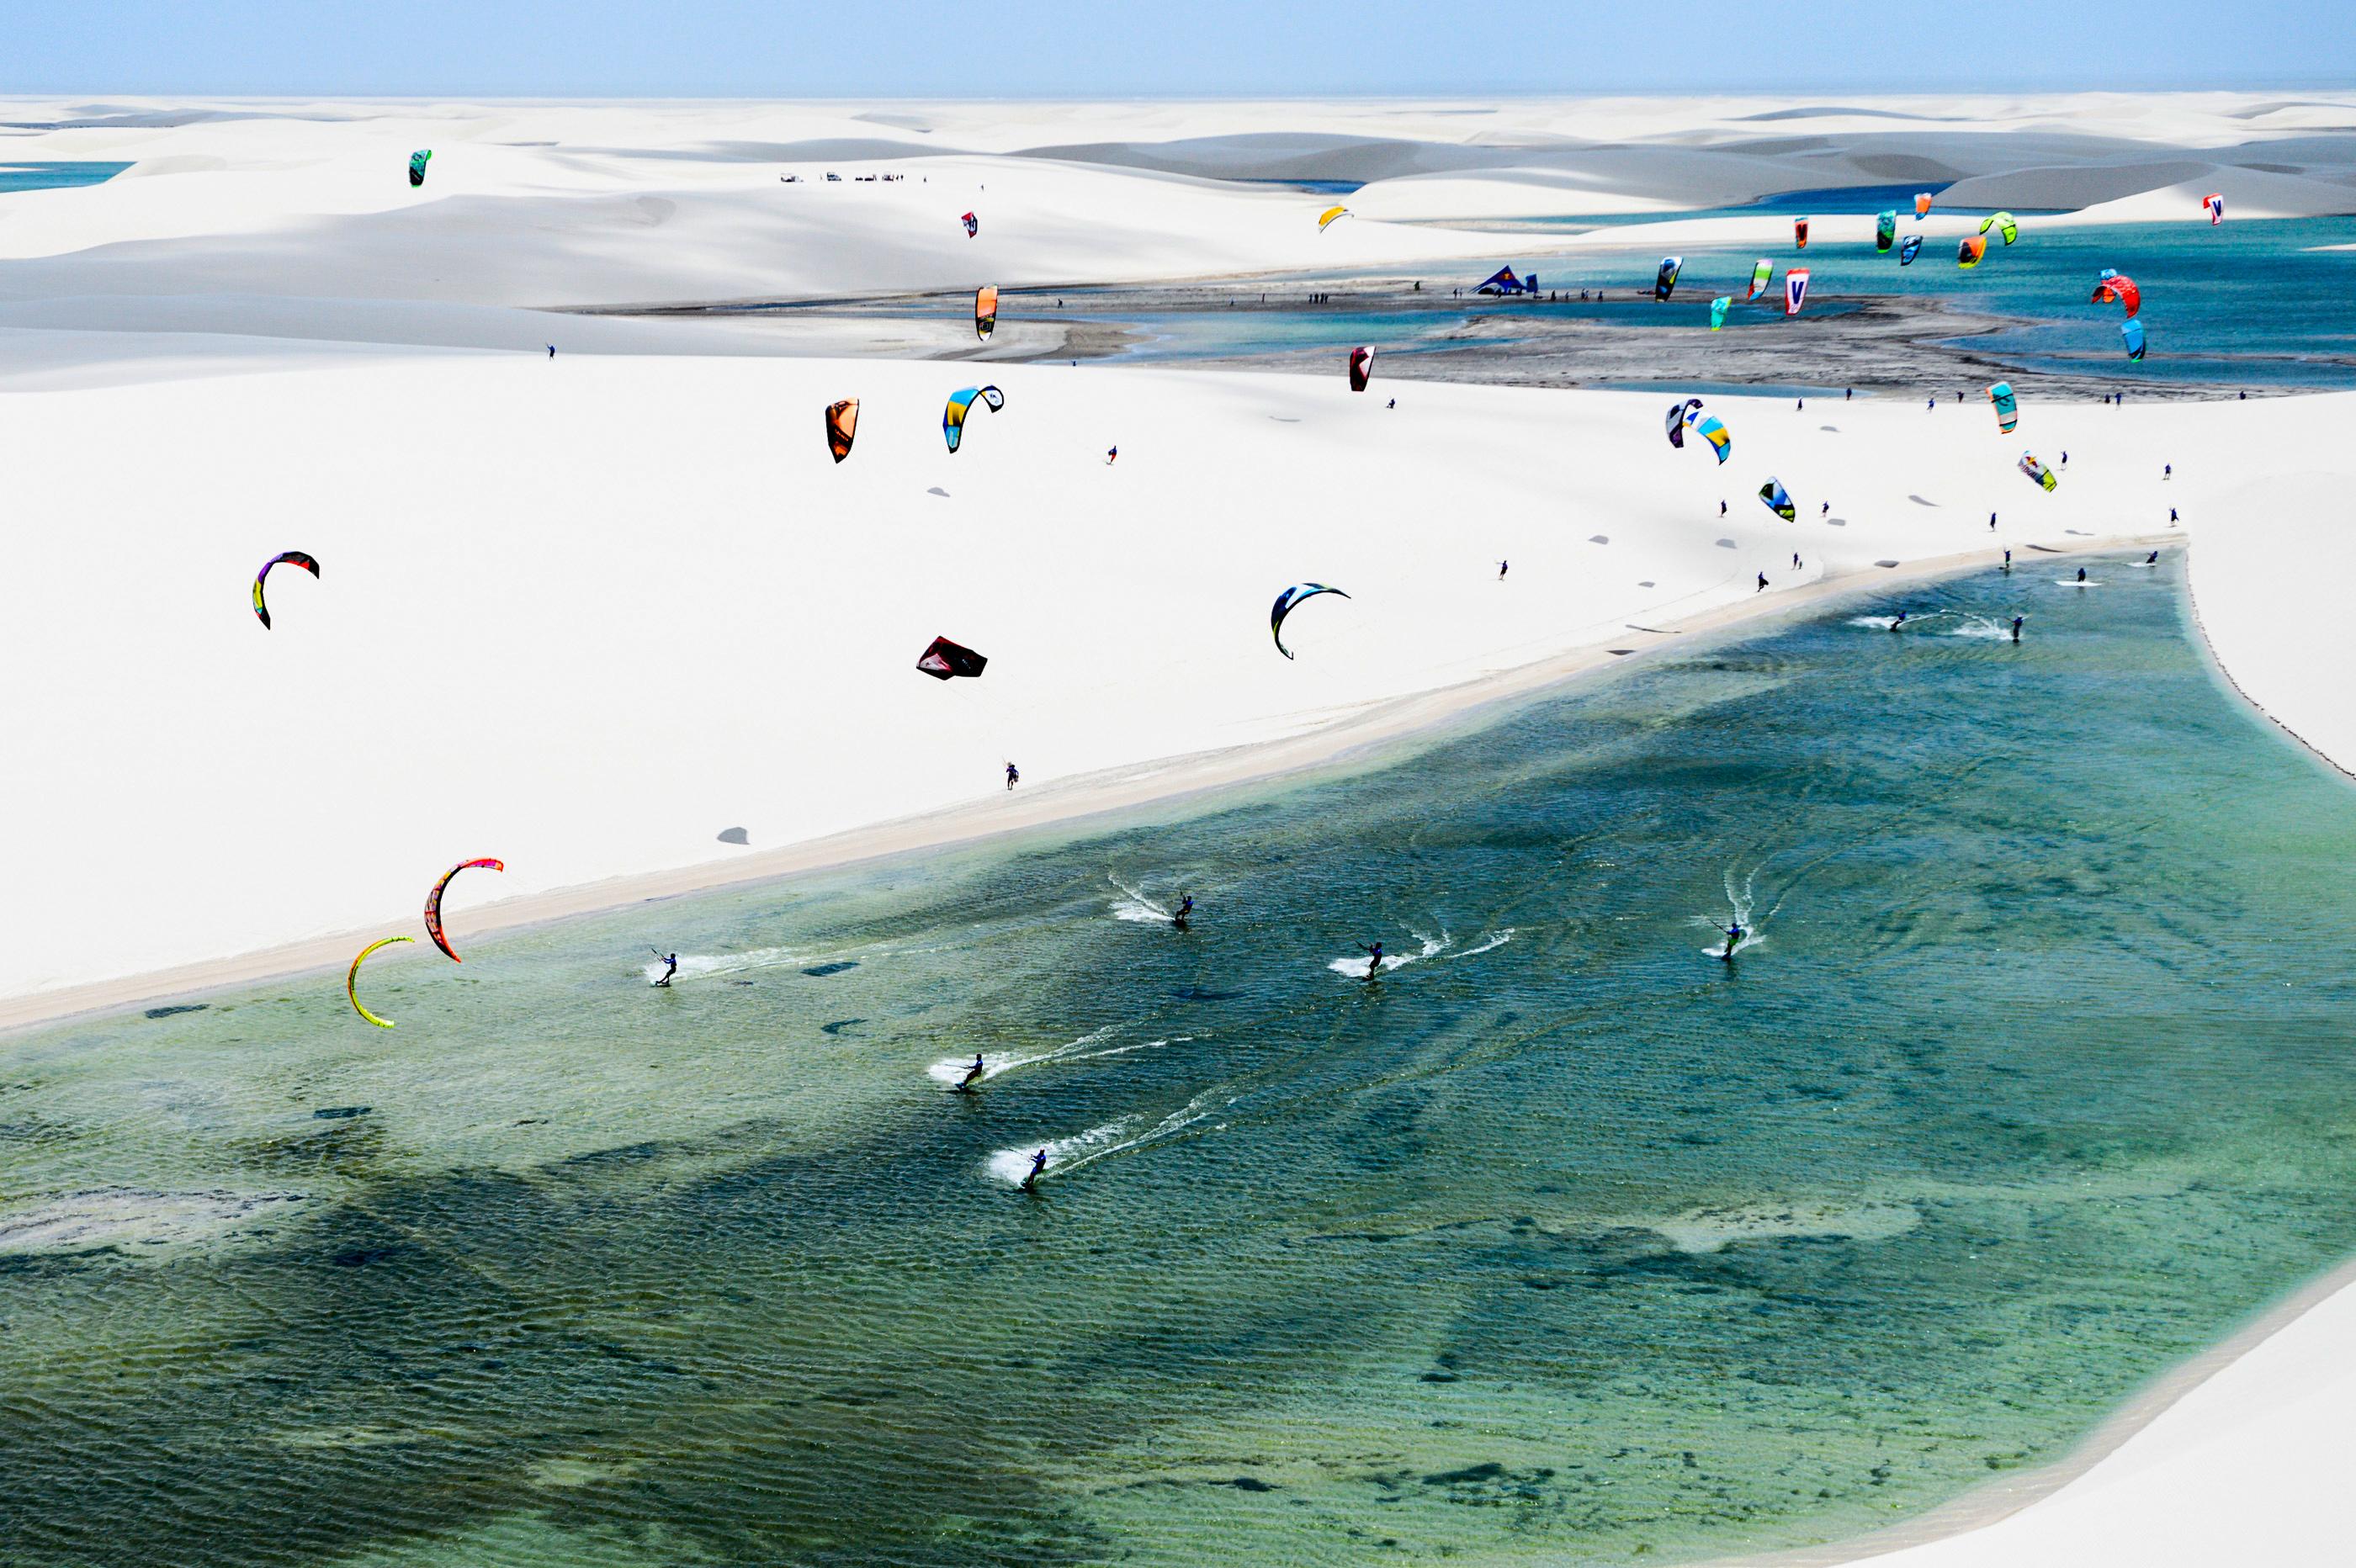 Freeride kitesurfing wallpaper Red Bull Rally dos Ventos in Brazil 2800x1864